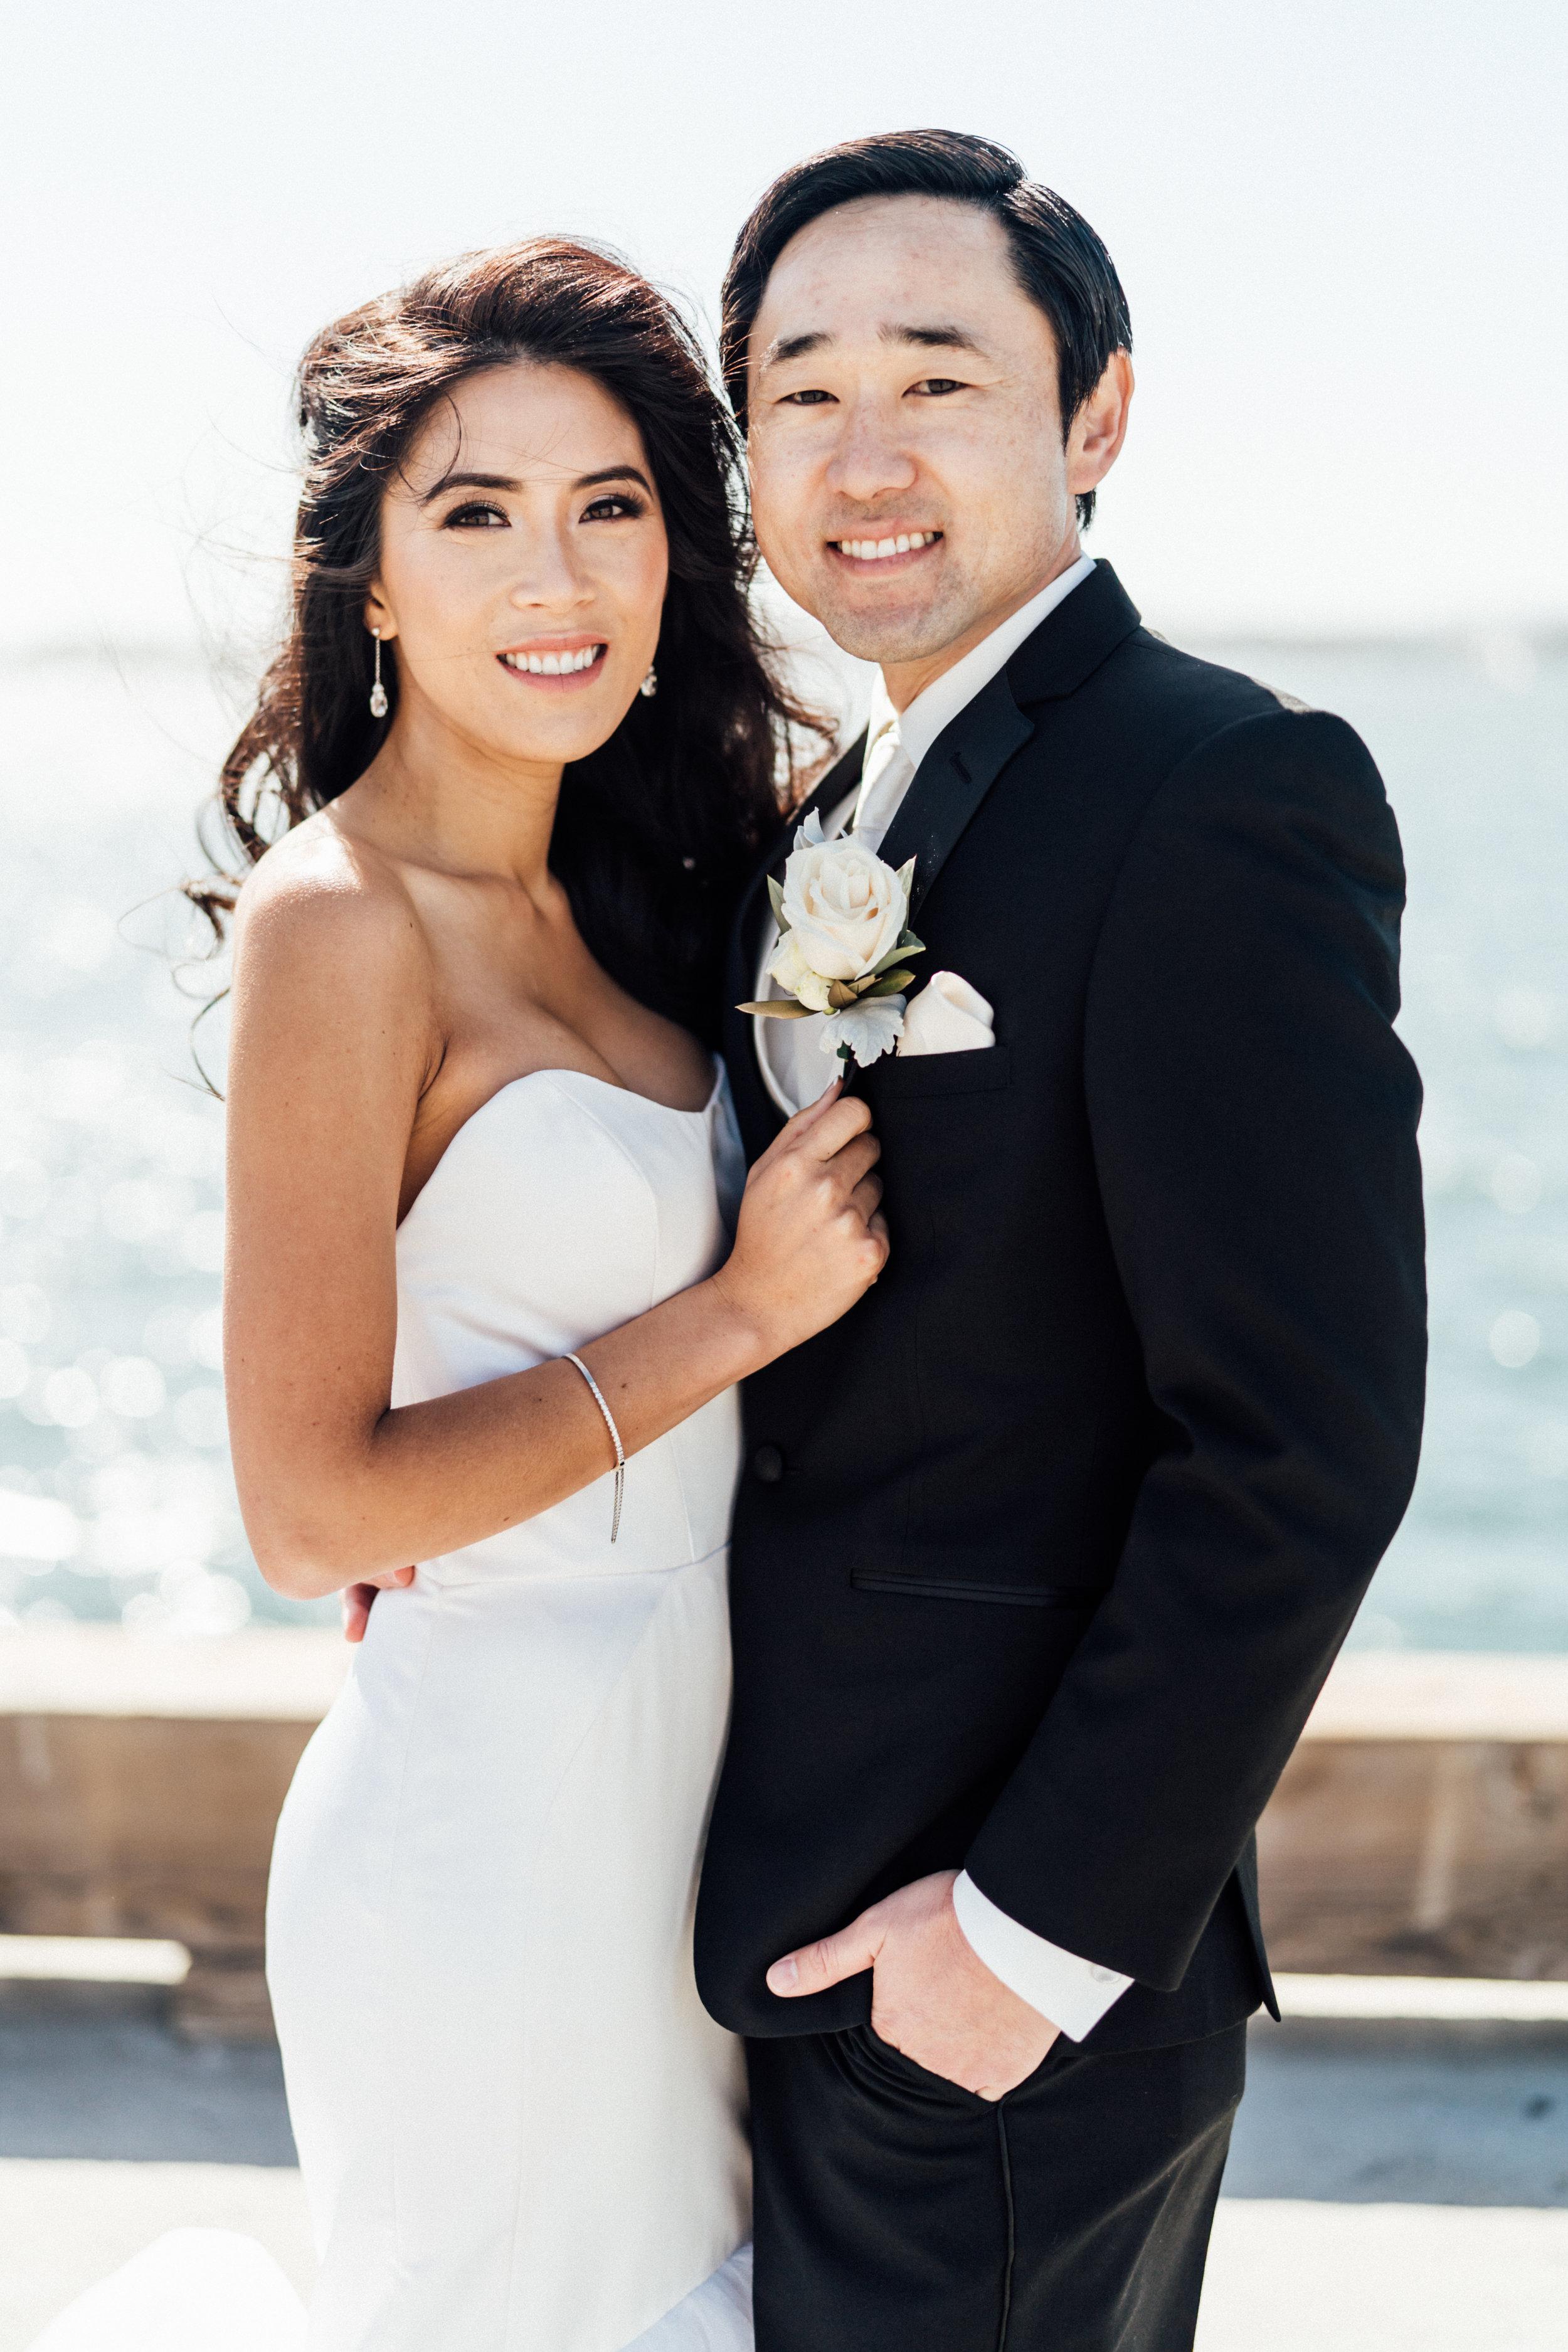 170 Anna _ Danny Wedding SUP05868.jpg